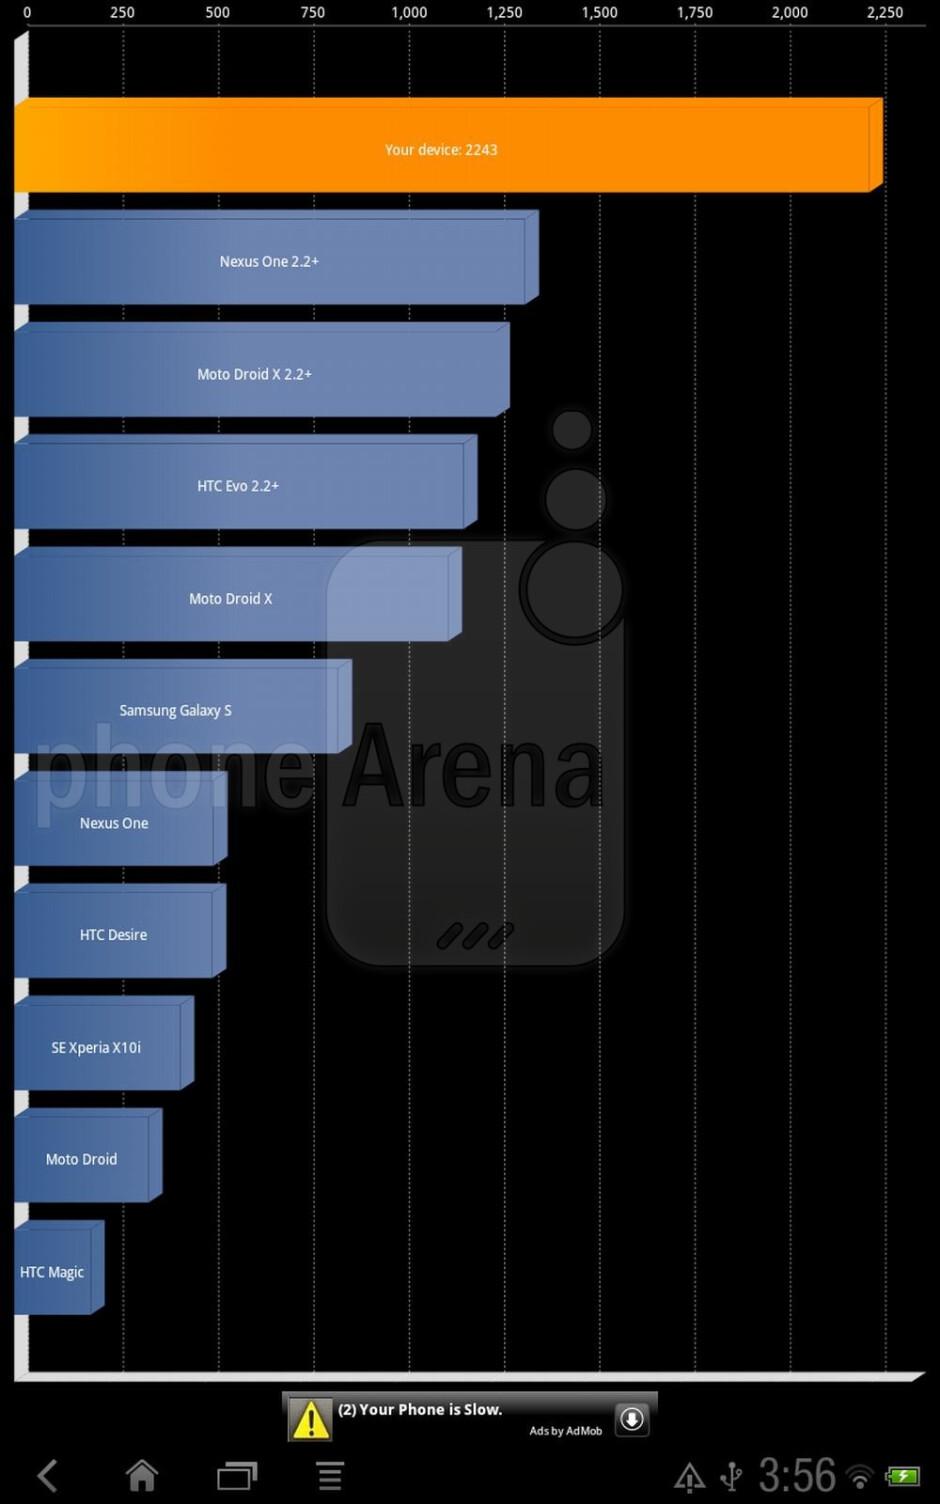 Quadrant Benchmark - HTC Jetstream benchmark tests